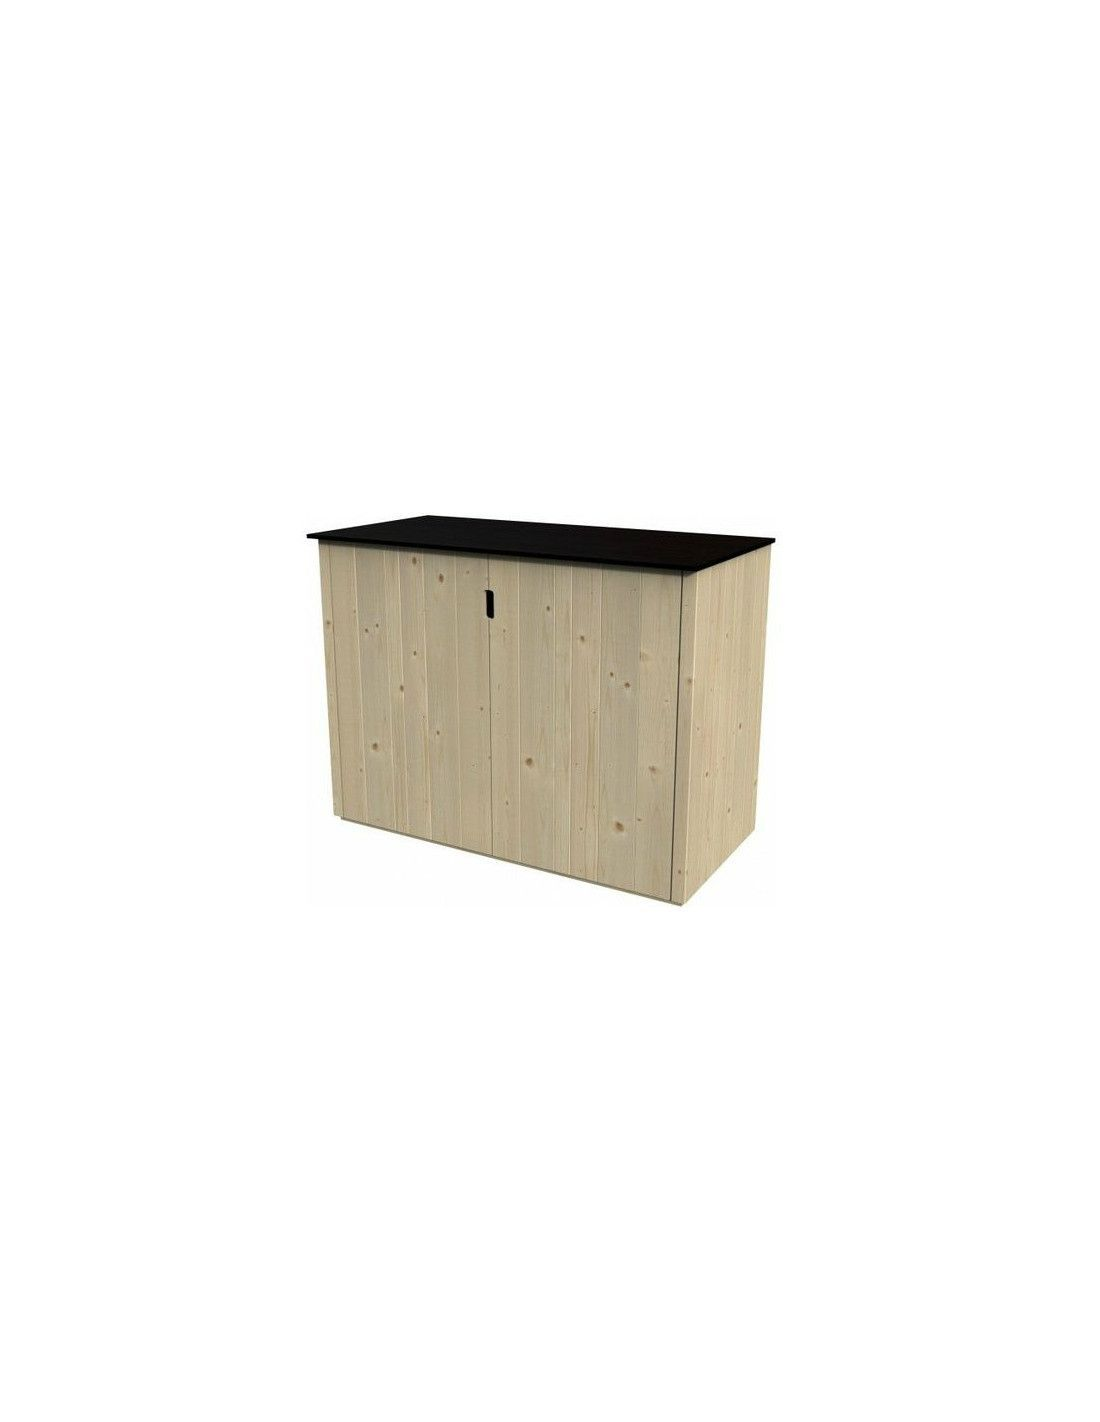 Armarios de exterior en madera ideal para jard n hortum for Casetas para almacenaje exterior